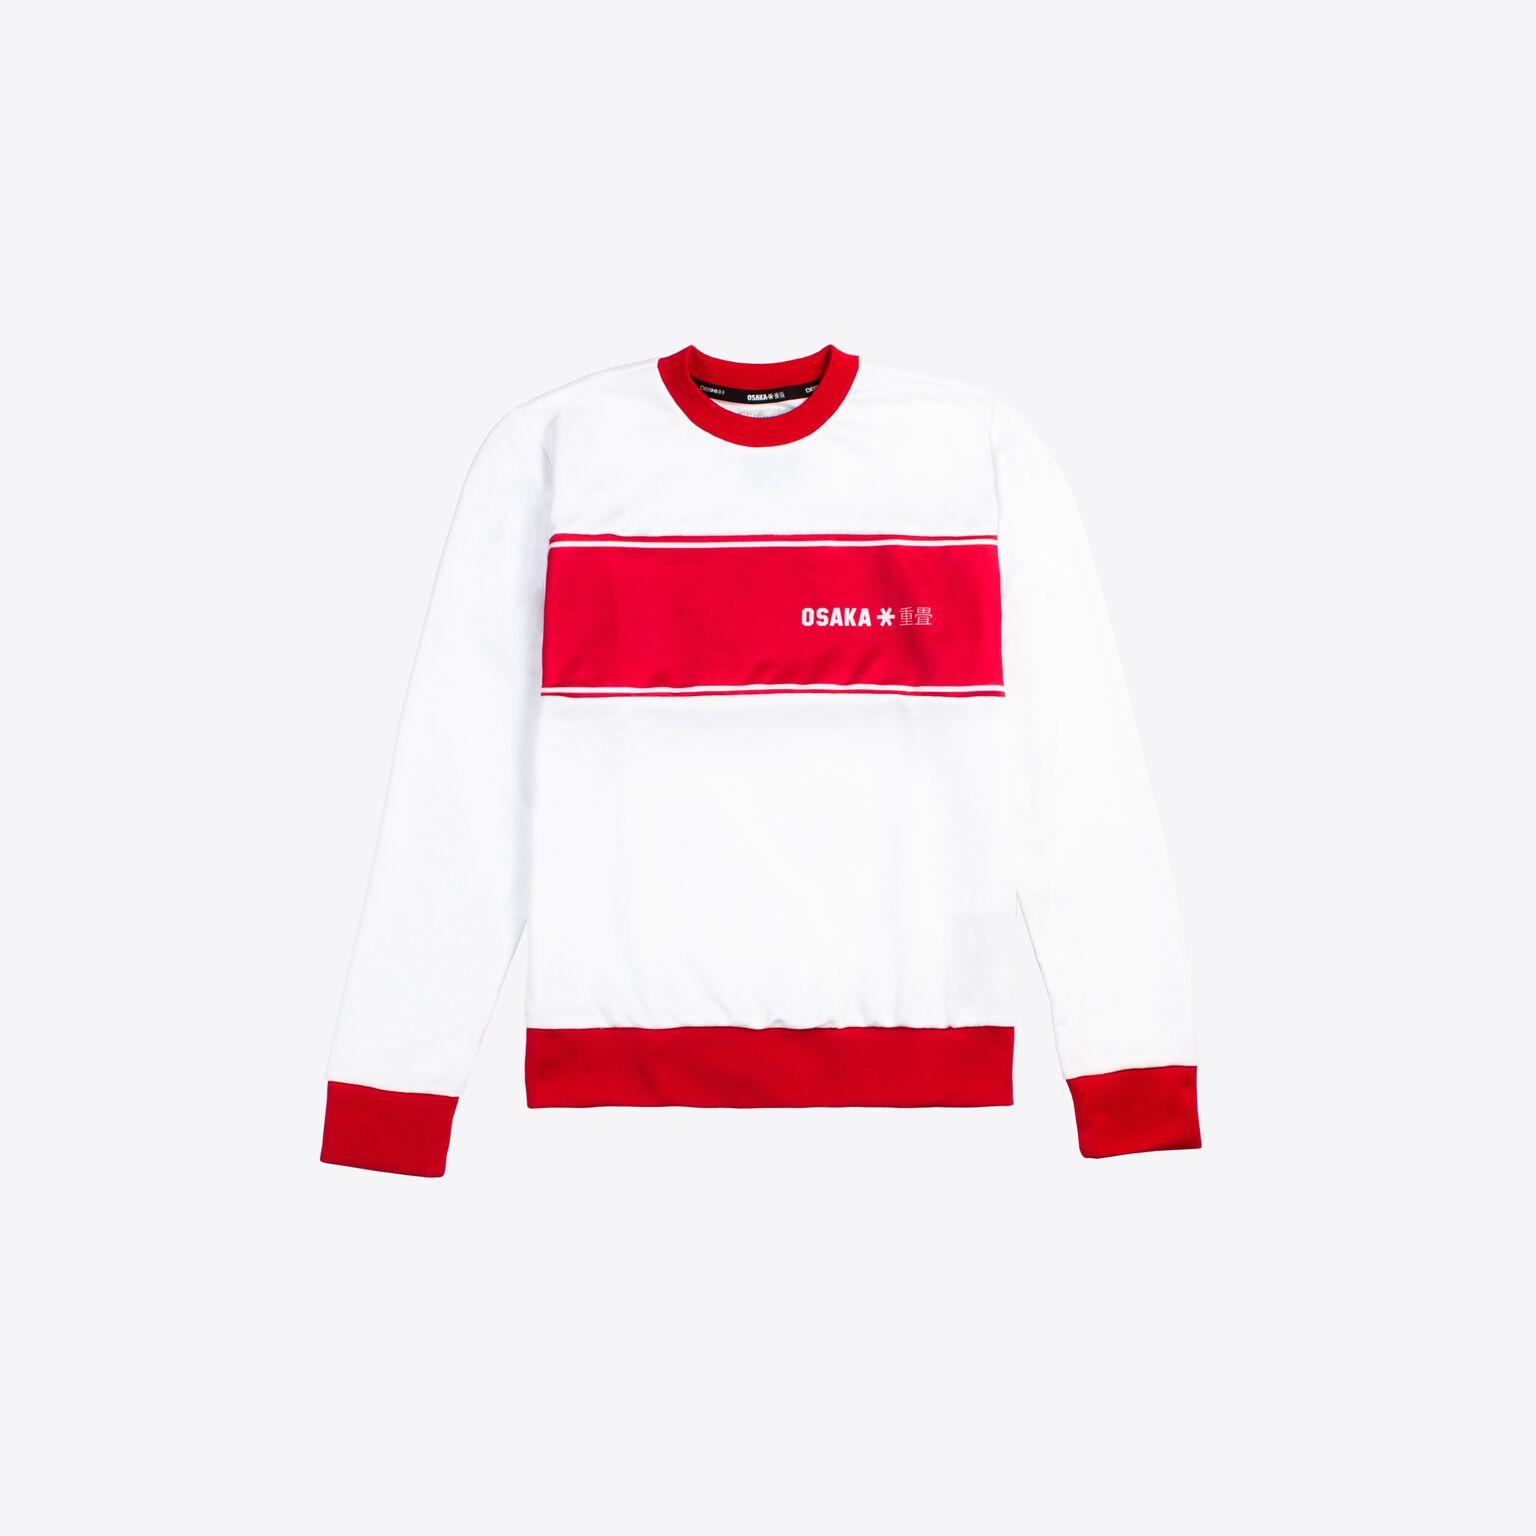 842102605d0 Osaka sweater kids Retro ROOD - De Hockeyzaak